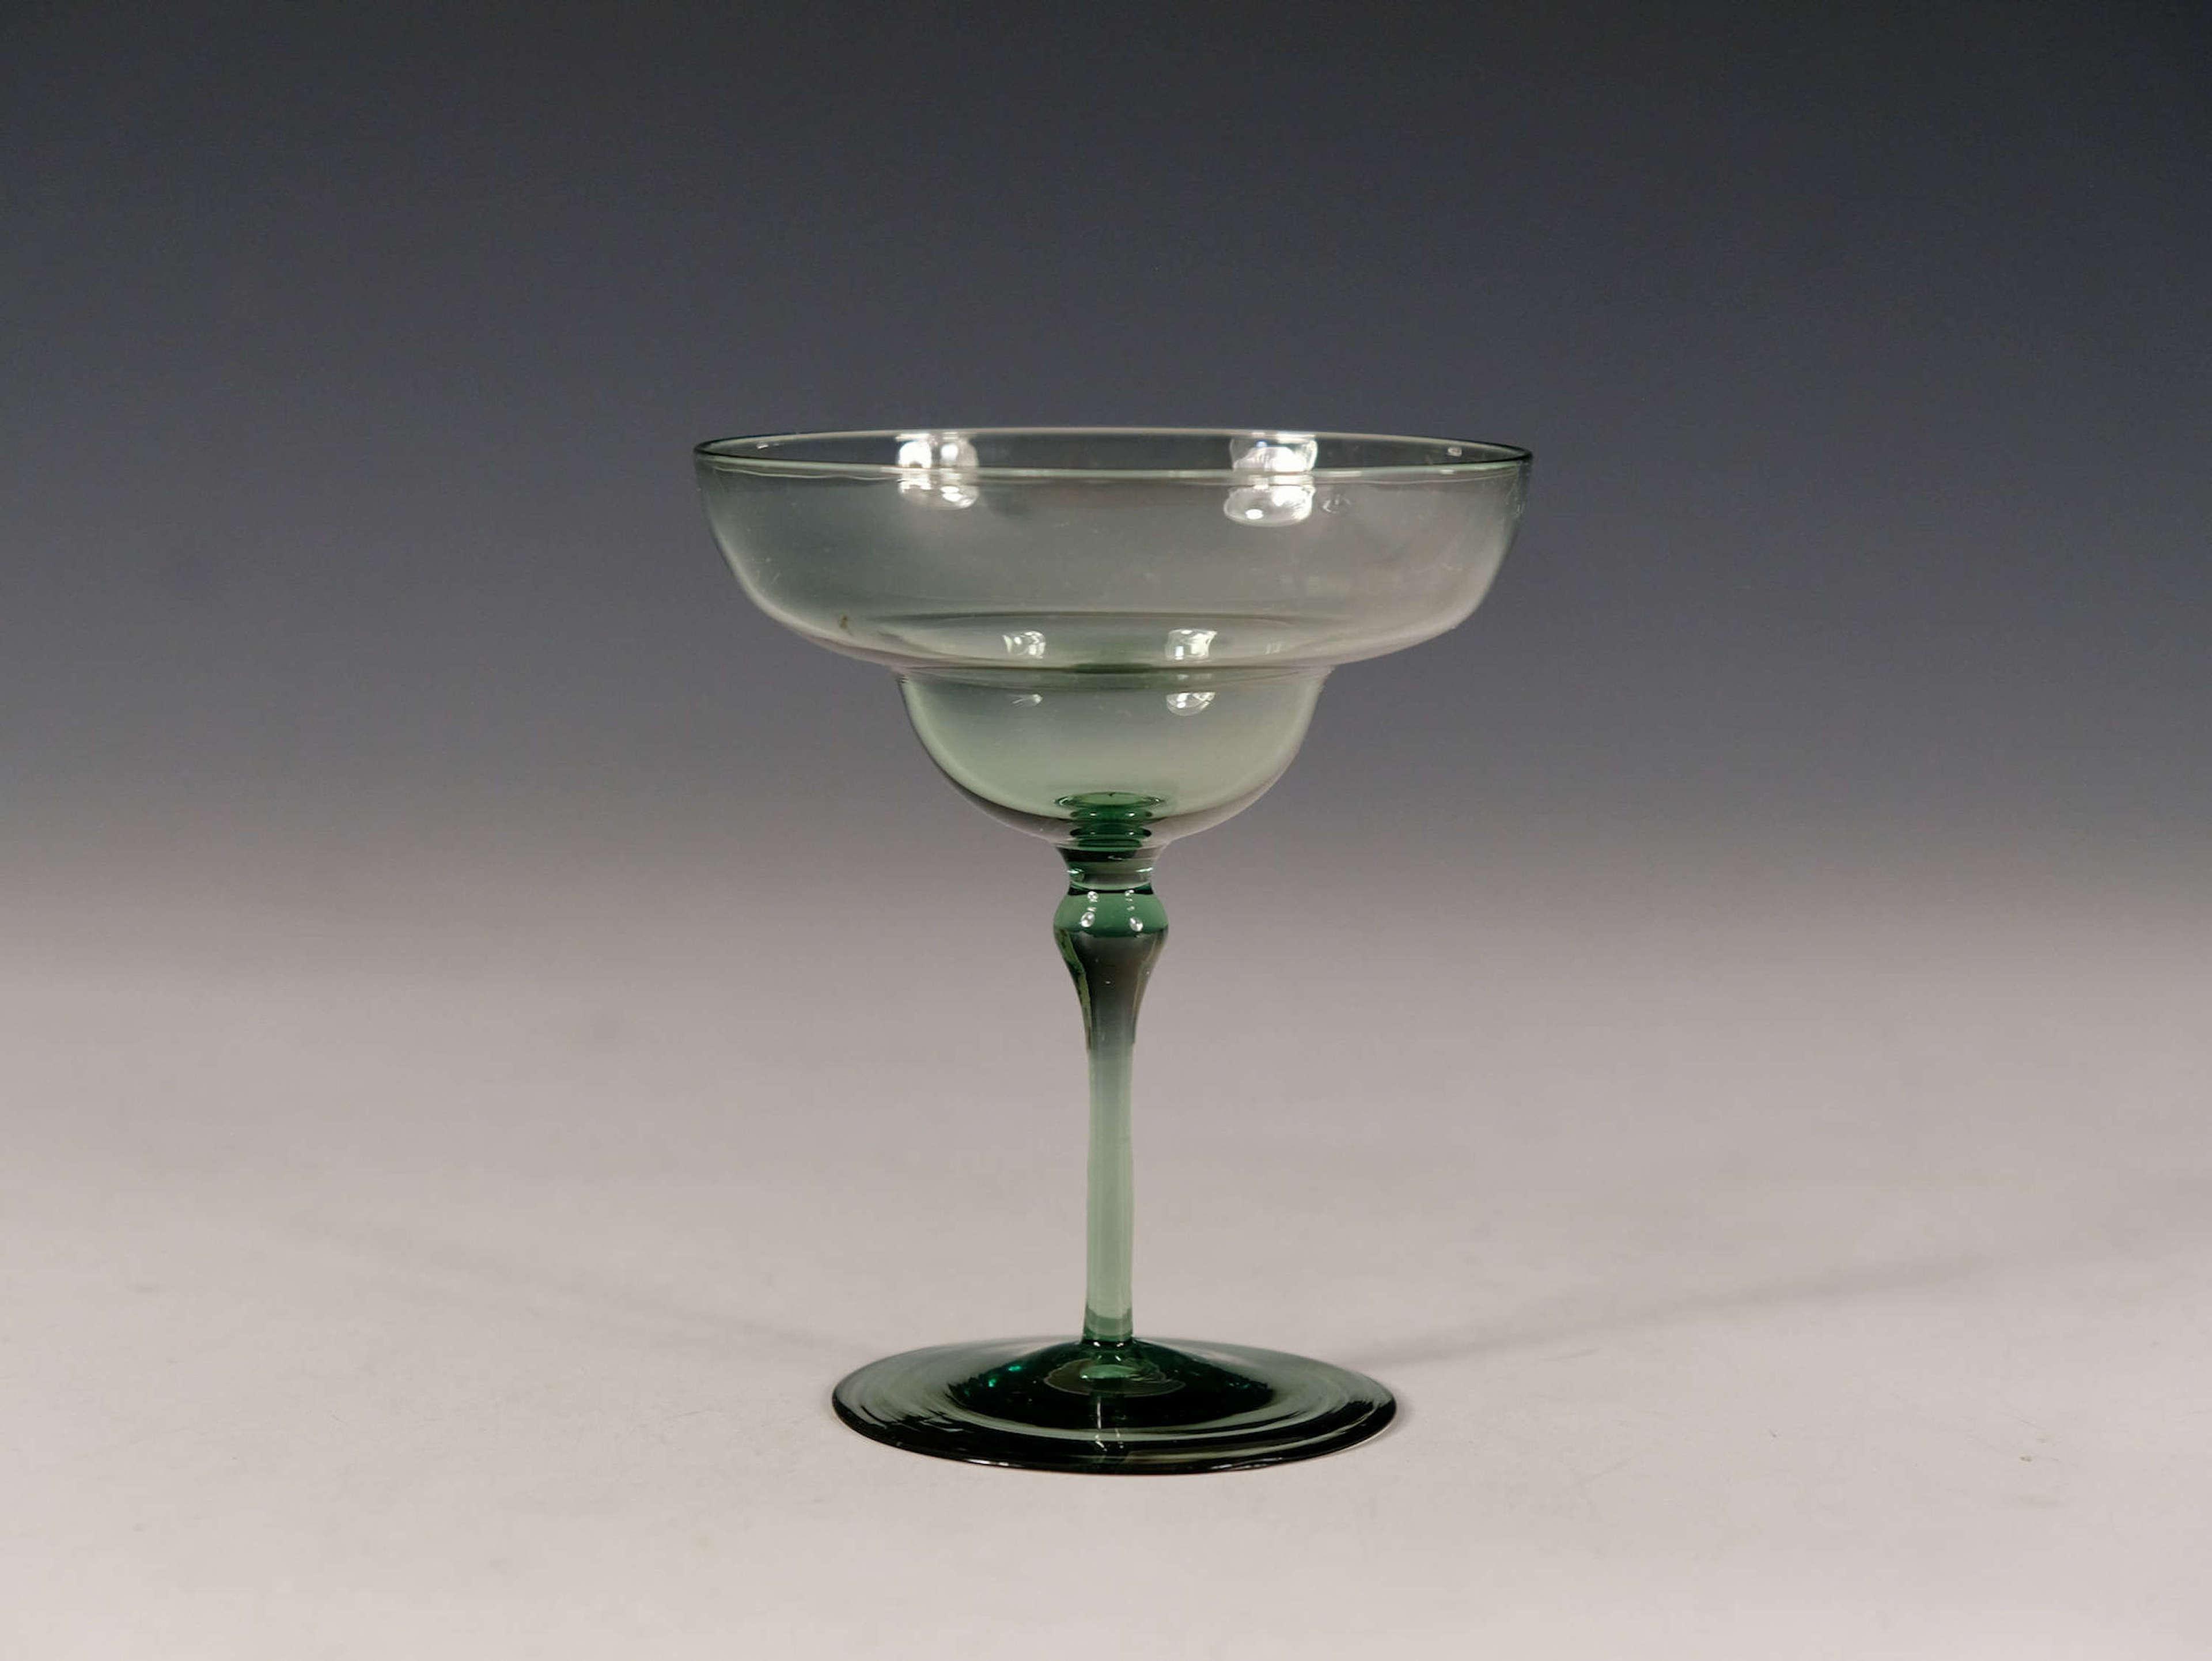 Antique glass champagne glass T G Jackson c1870